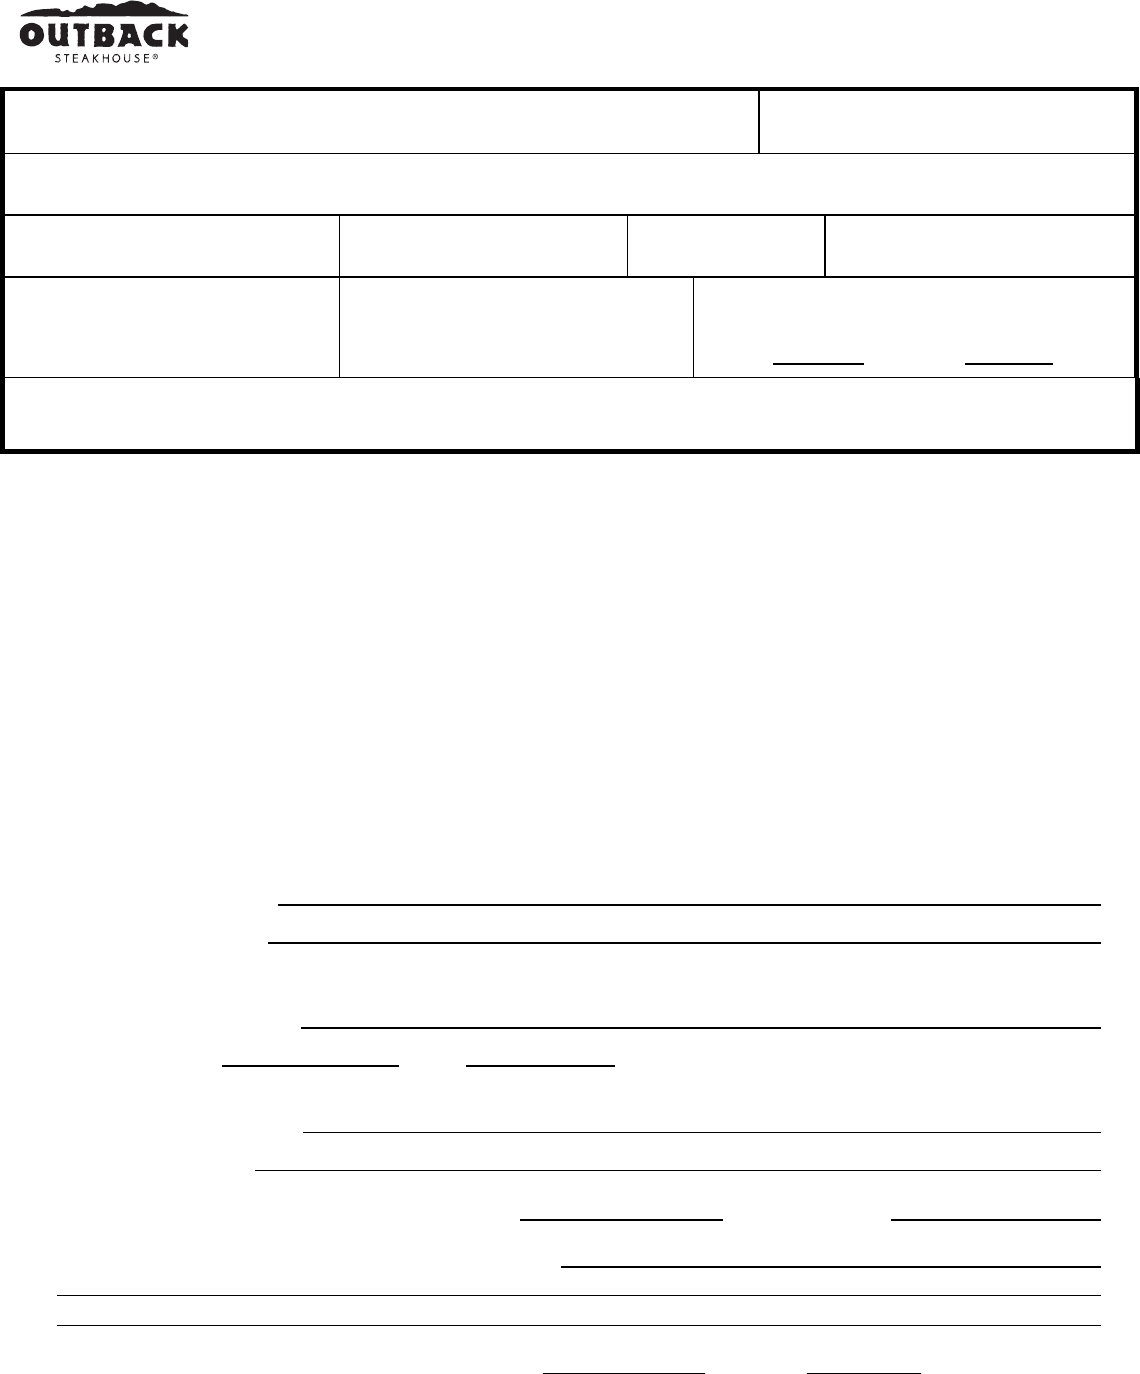 Free Printable Outback Steakhouse Job Application Form